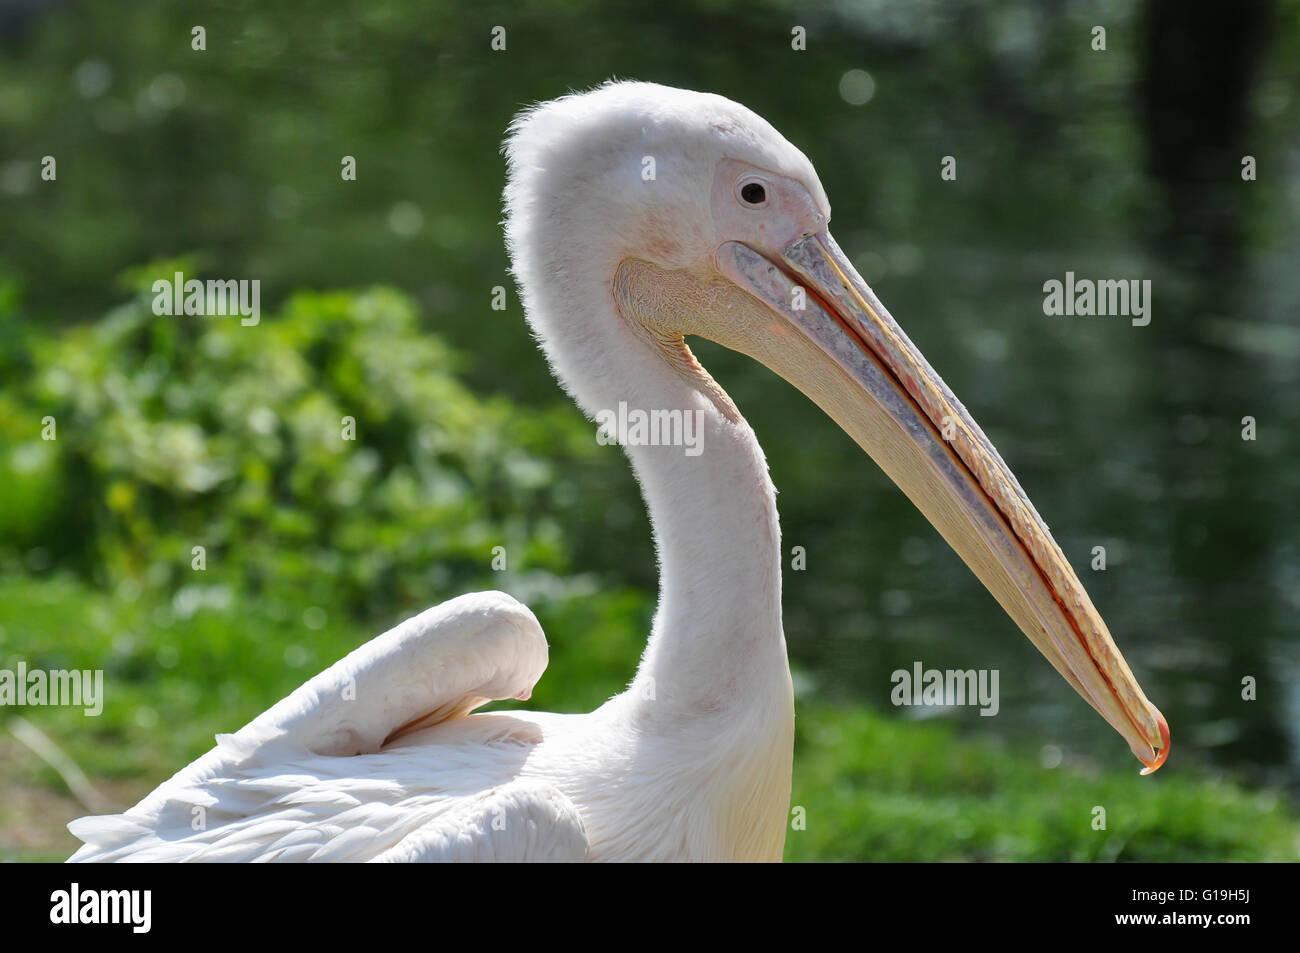 Pelican sunning itself at London Zoo, London, UK. Stock Photo